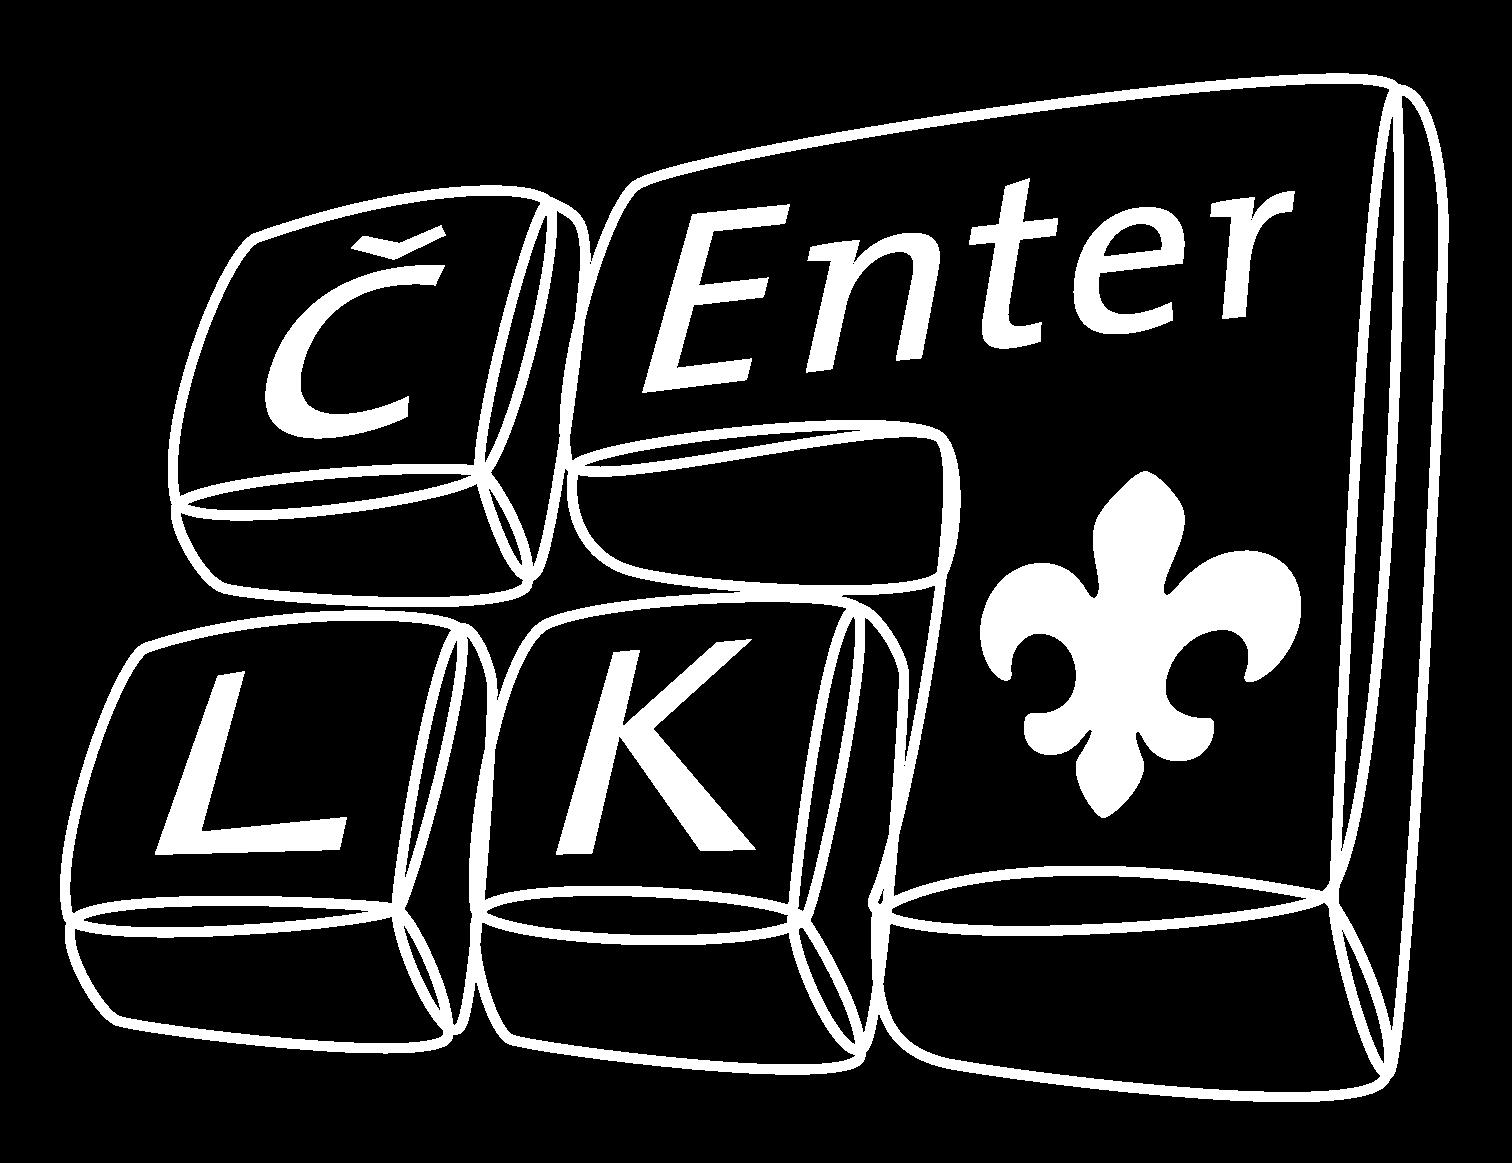 ČLK Enter